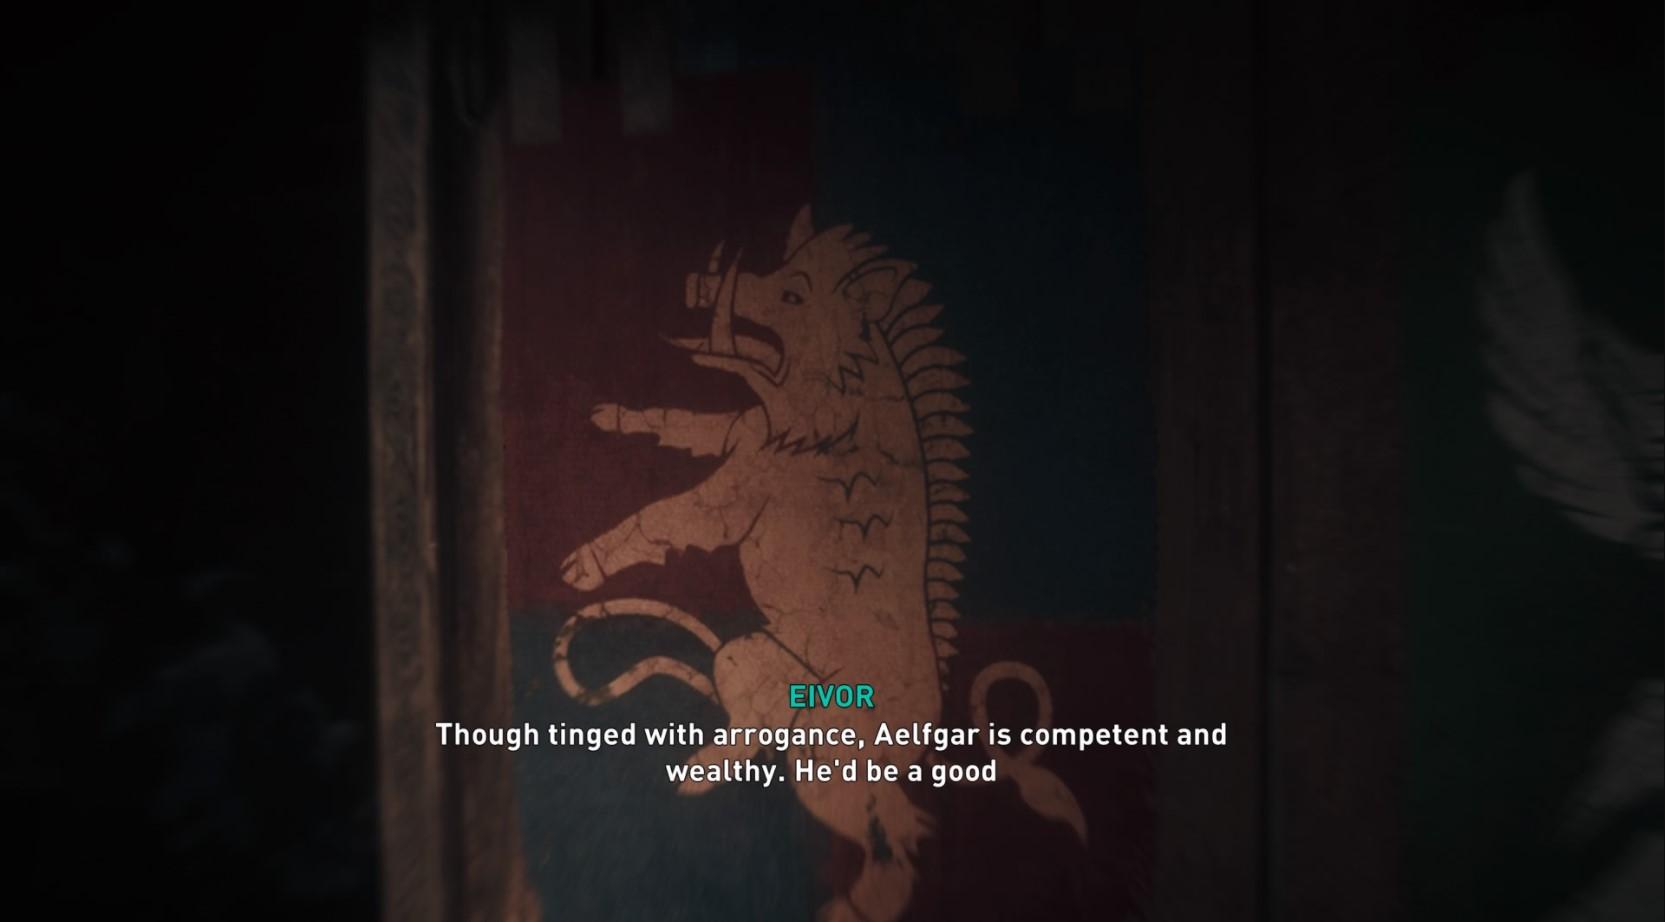 assassins creed valhalla lincolnscire ealdorman aelfgar